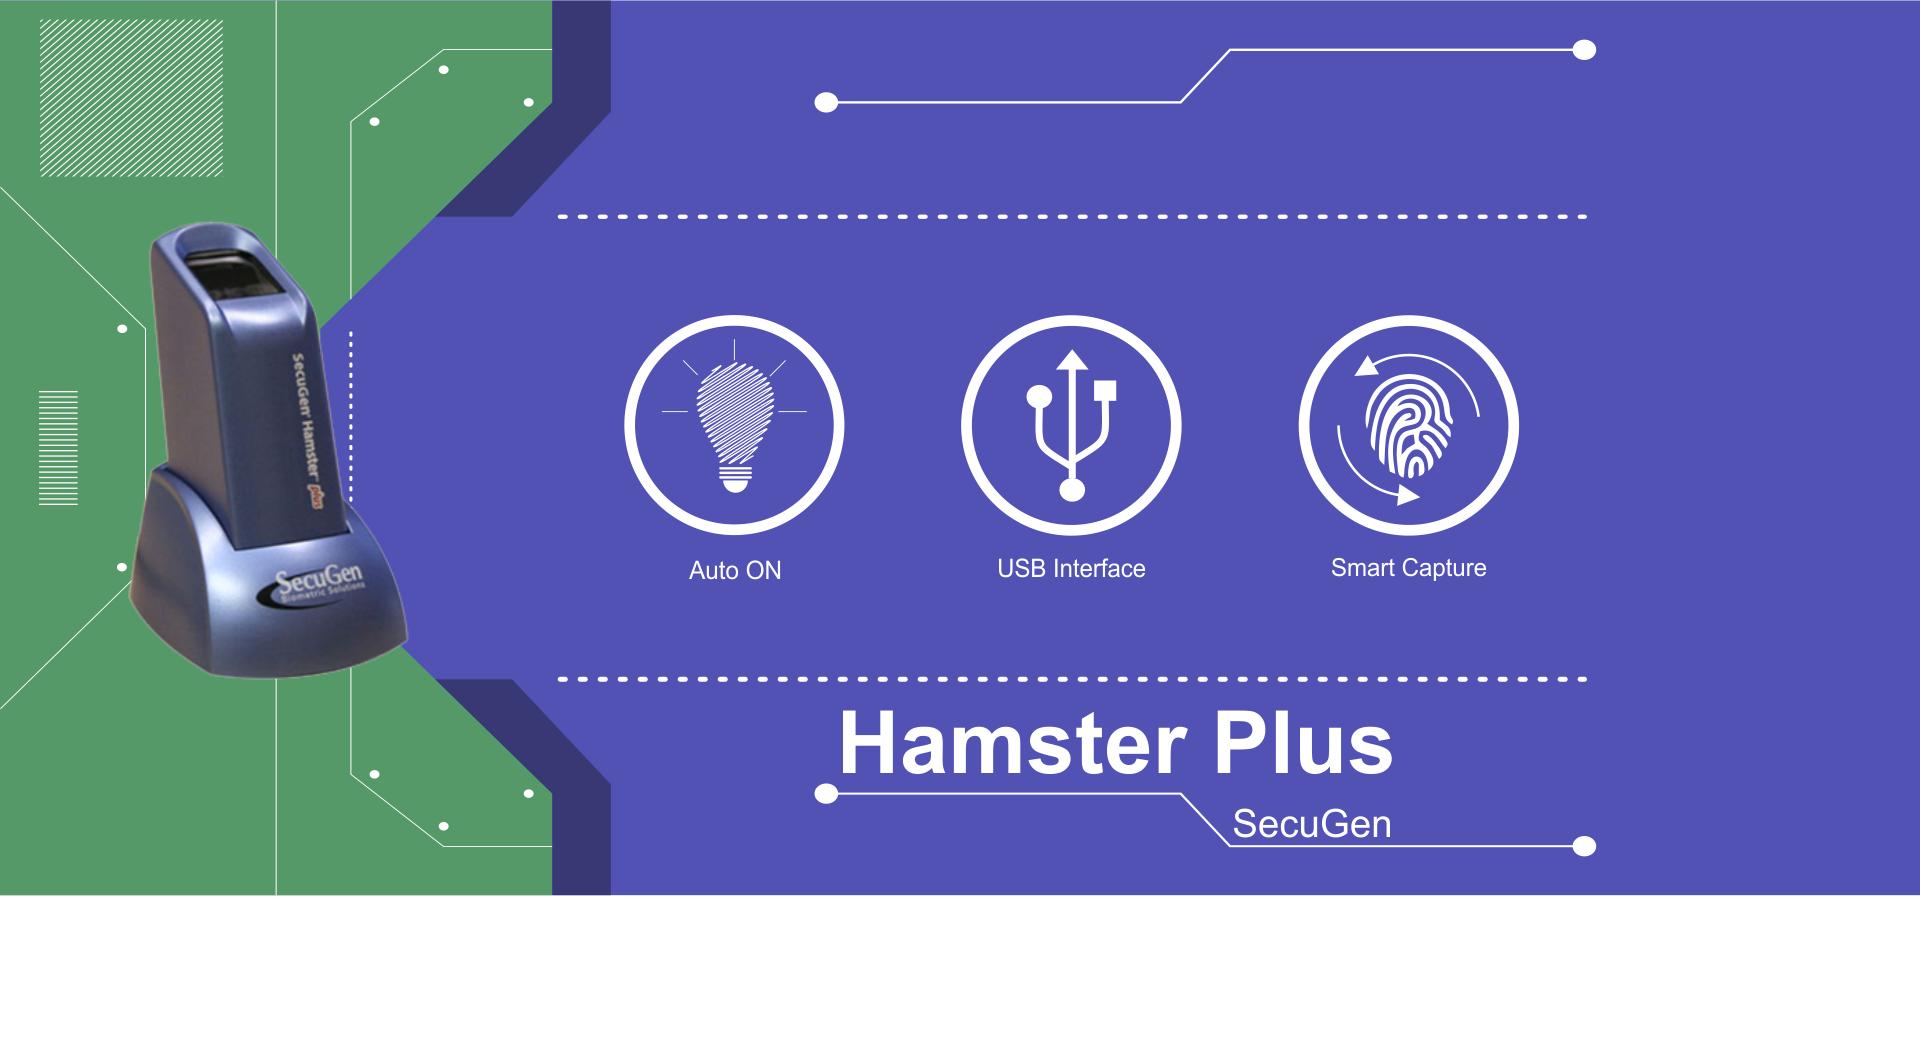 Hamster Plus